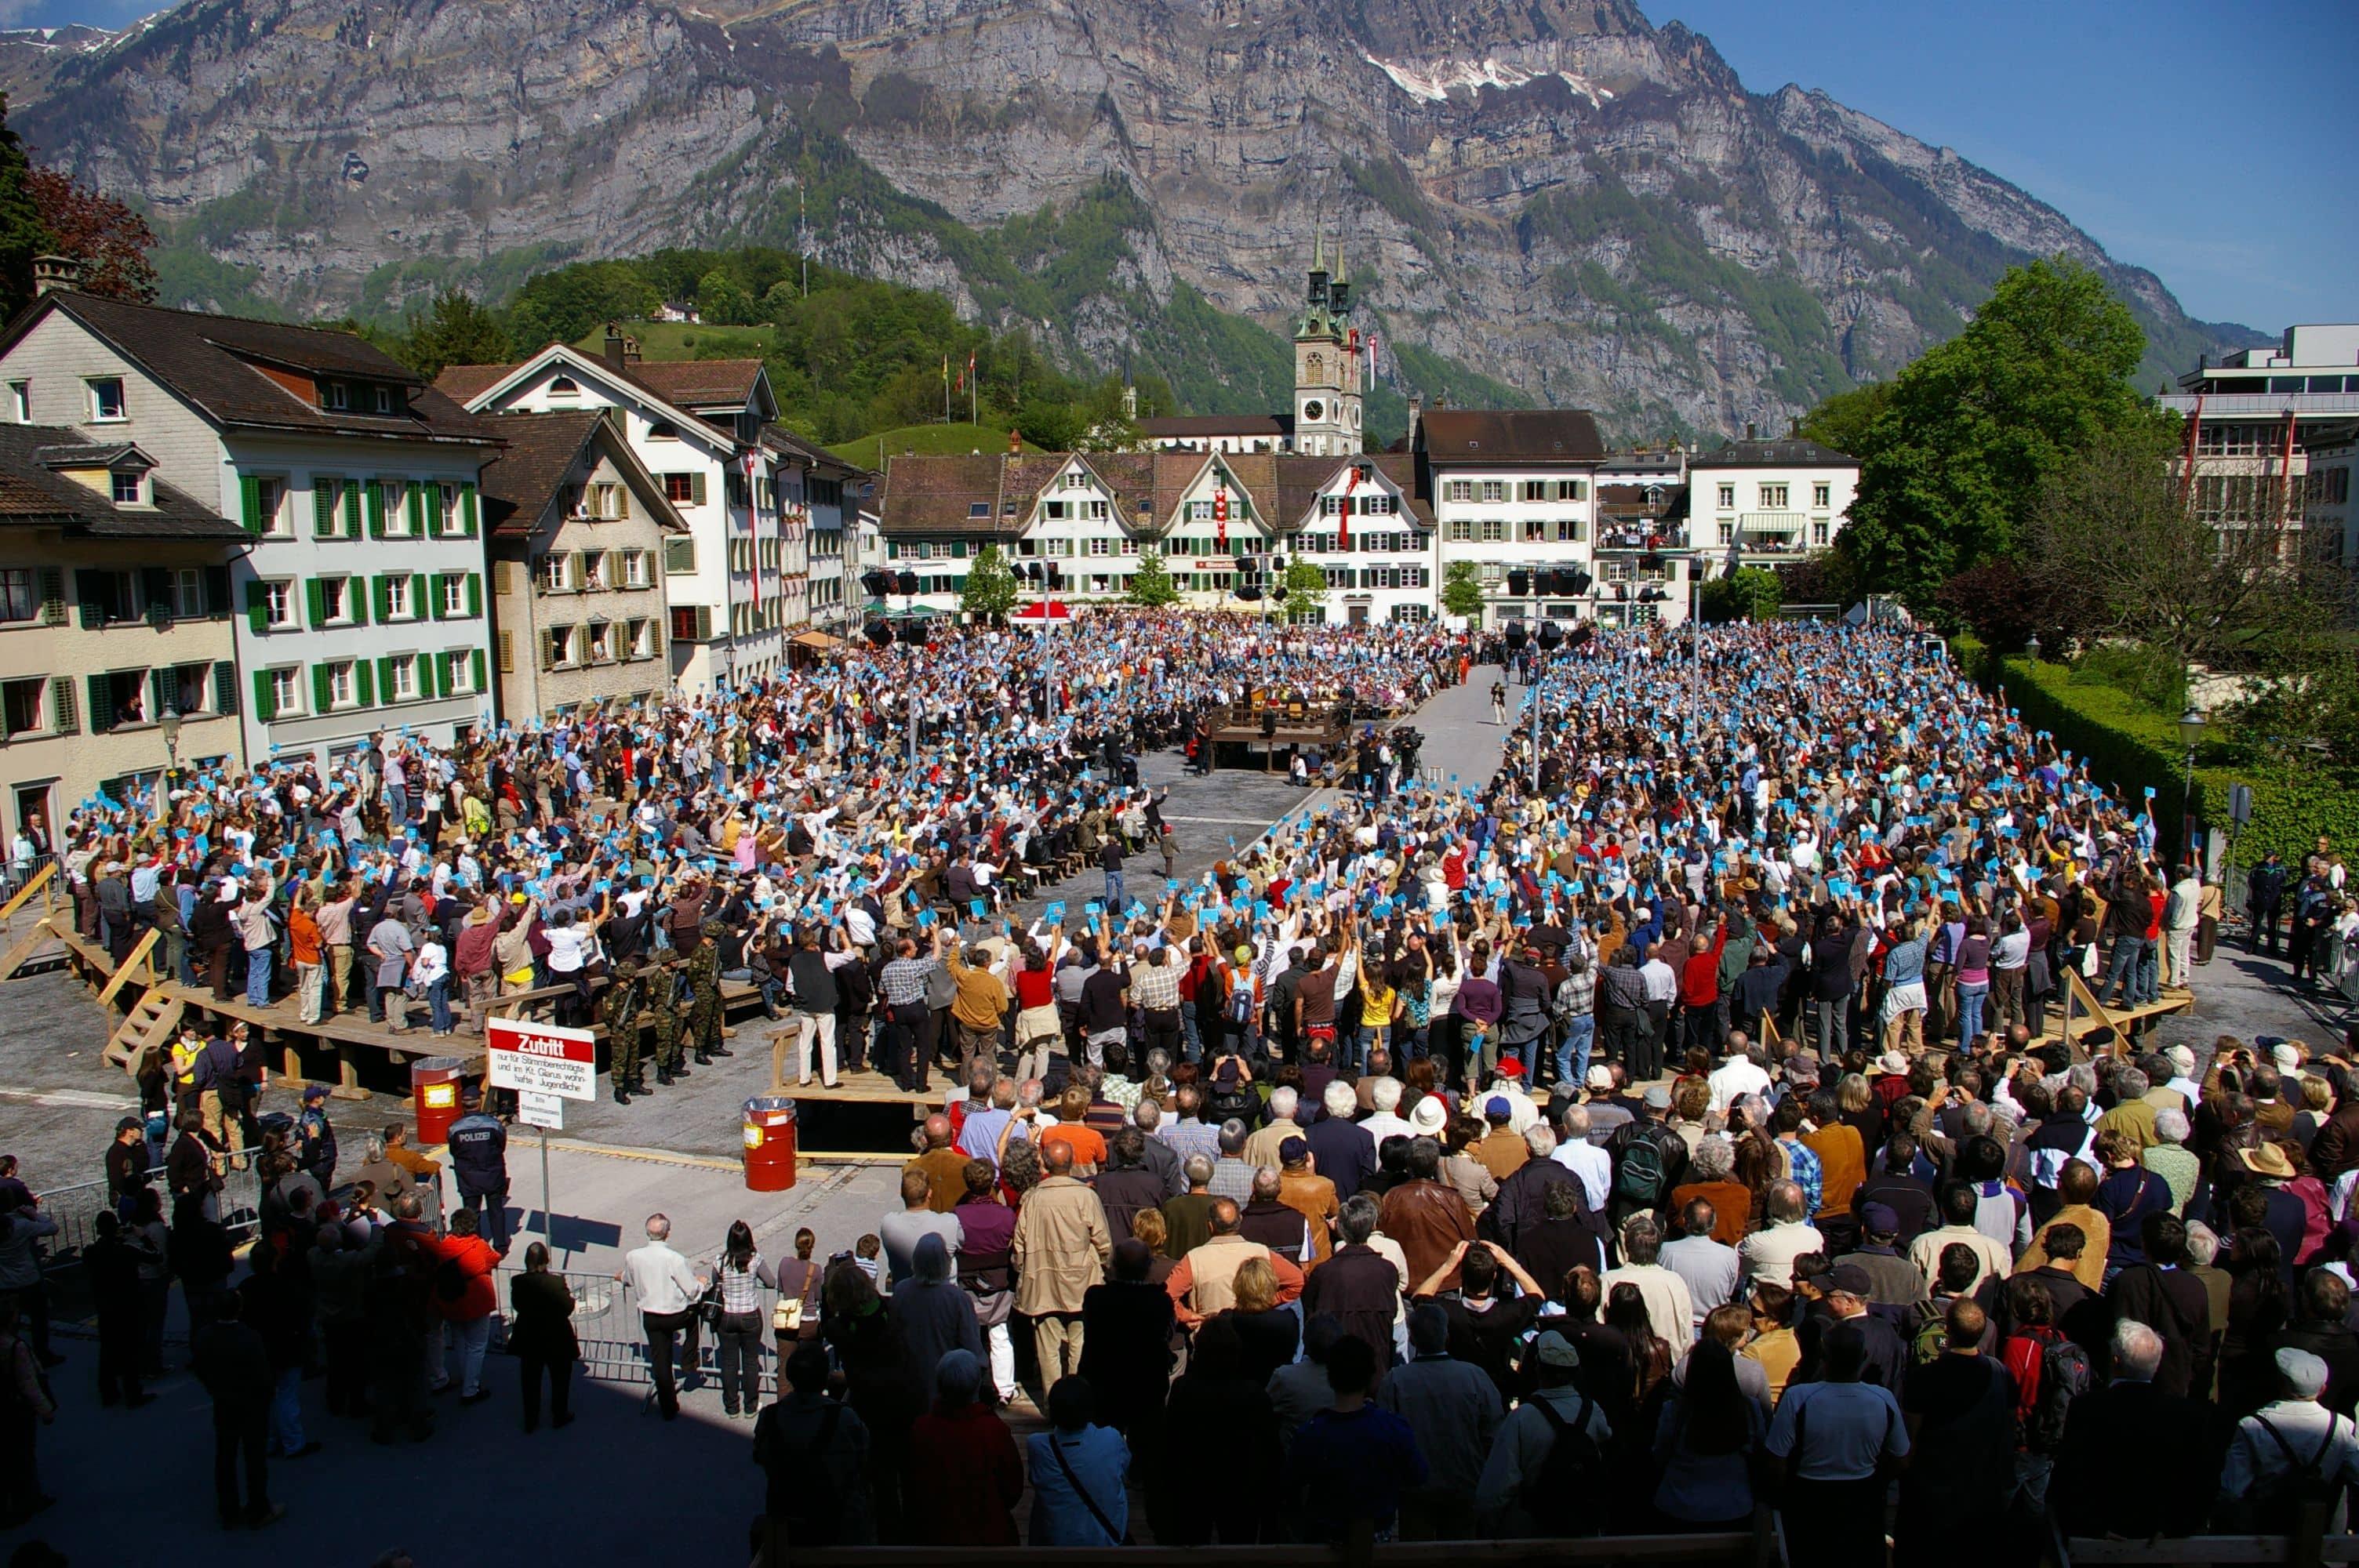 Fuente: http://upload.wikimedia.org/wikipedia/commons/7/7d/Landsgemeinde_Glarus%2C_2009.jpg